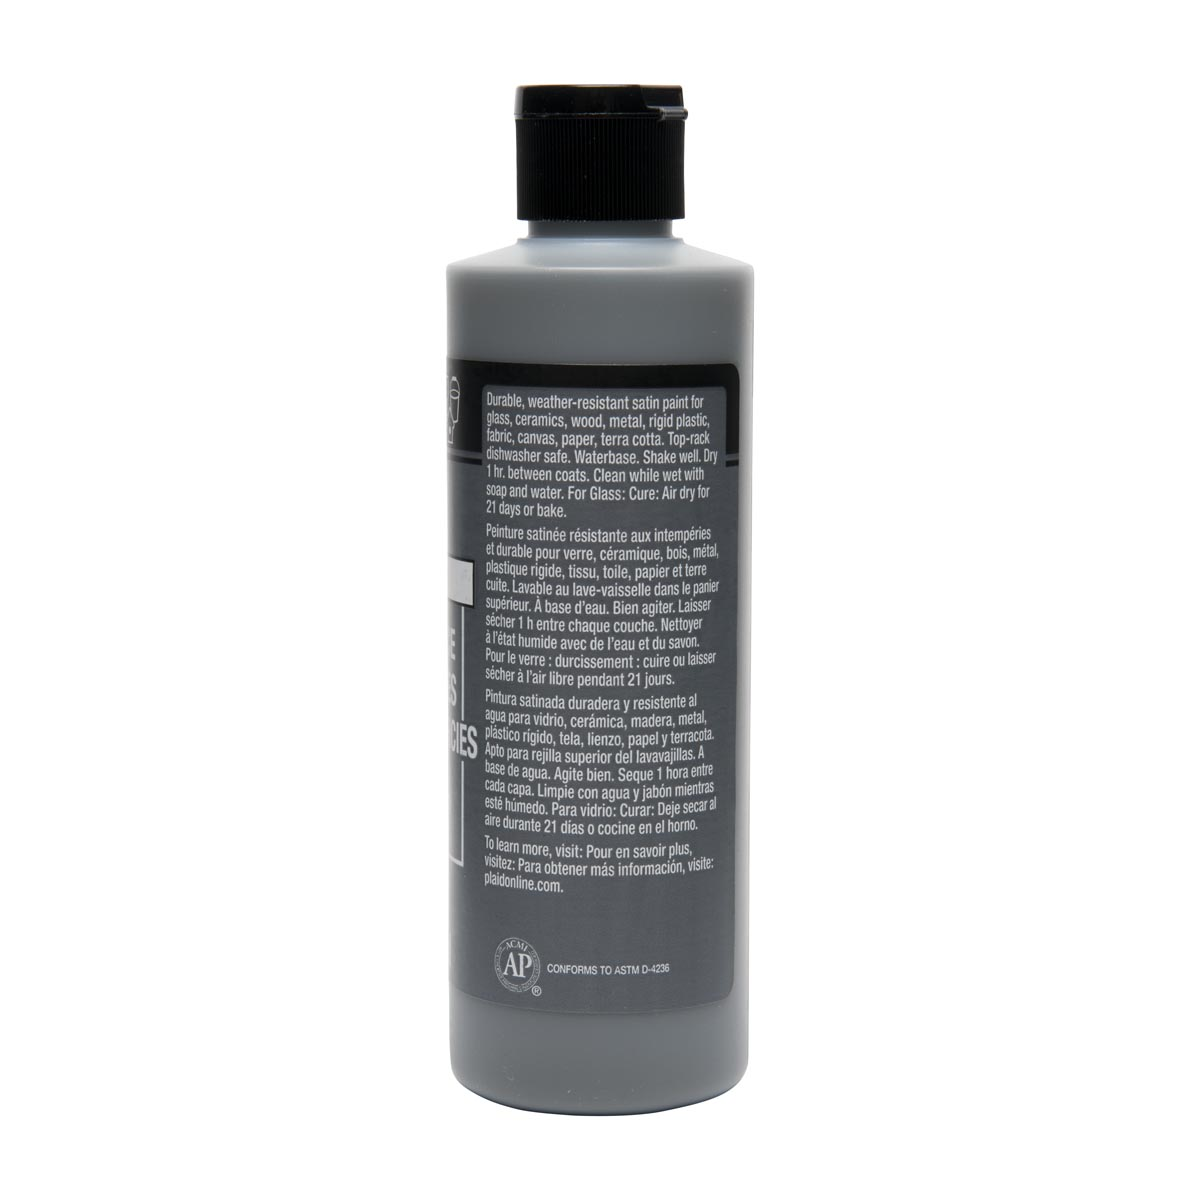 FolkArt ® Multi-Surface Satin Acrylic Paints - Medium Gray, 8 oz.